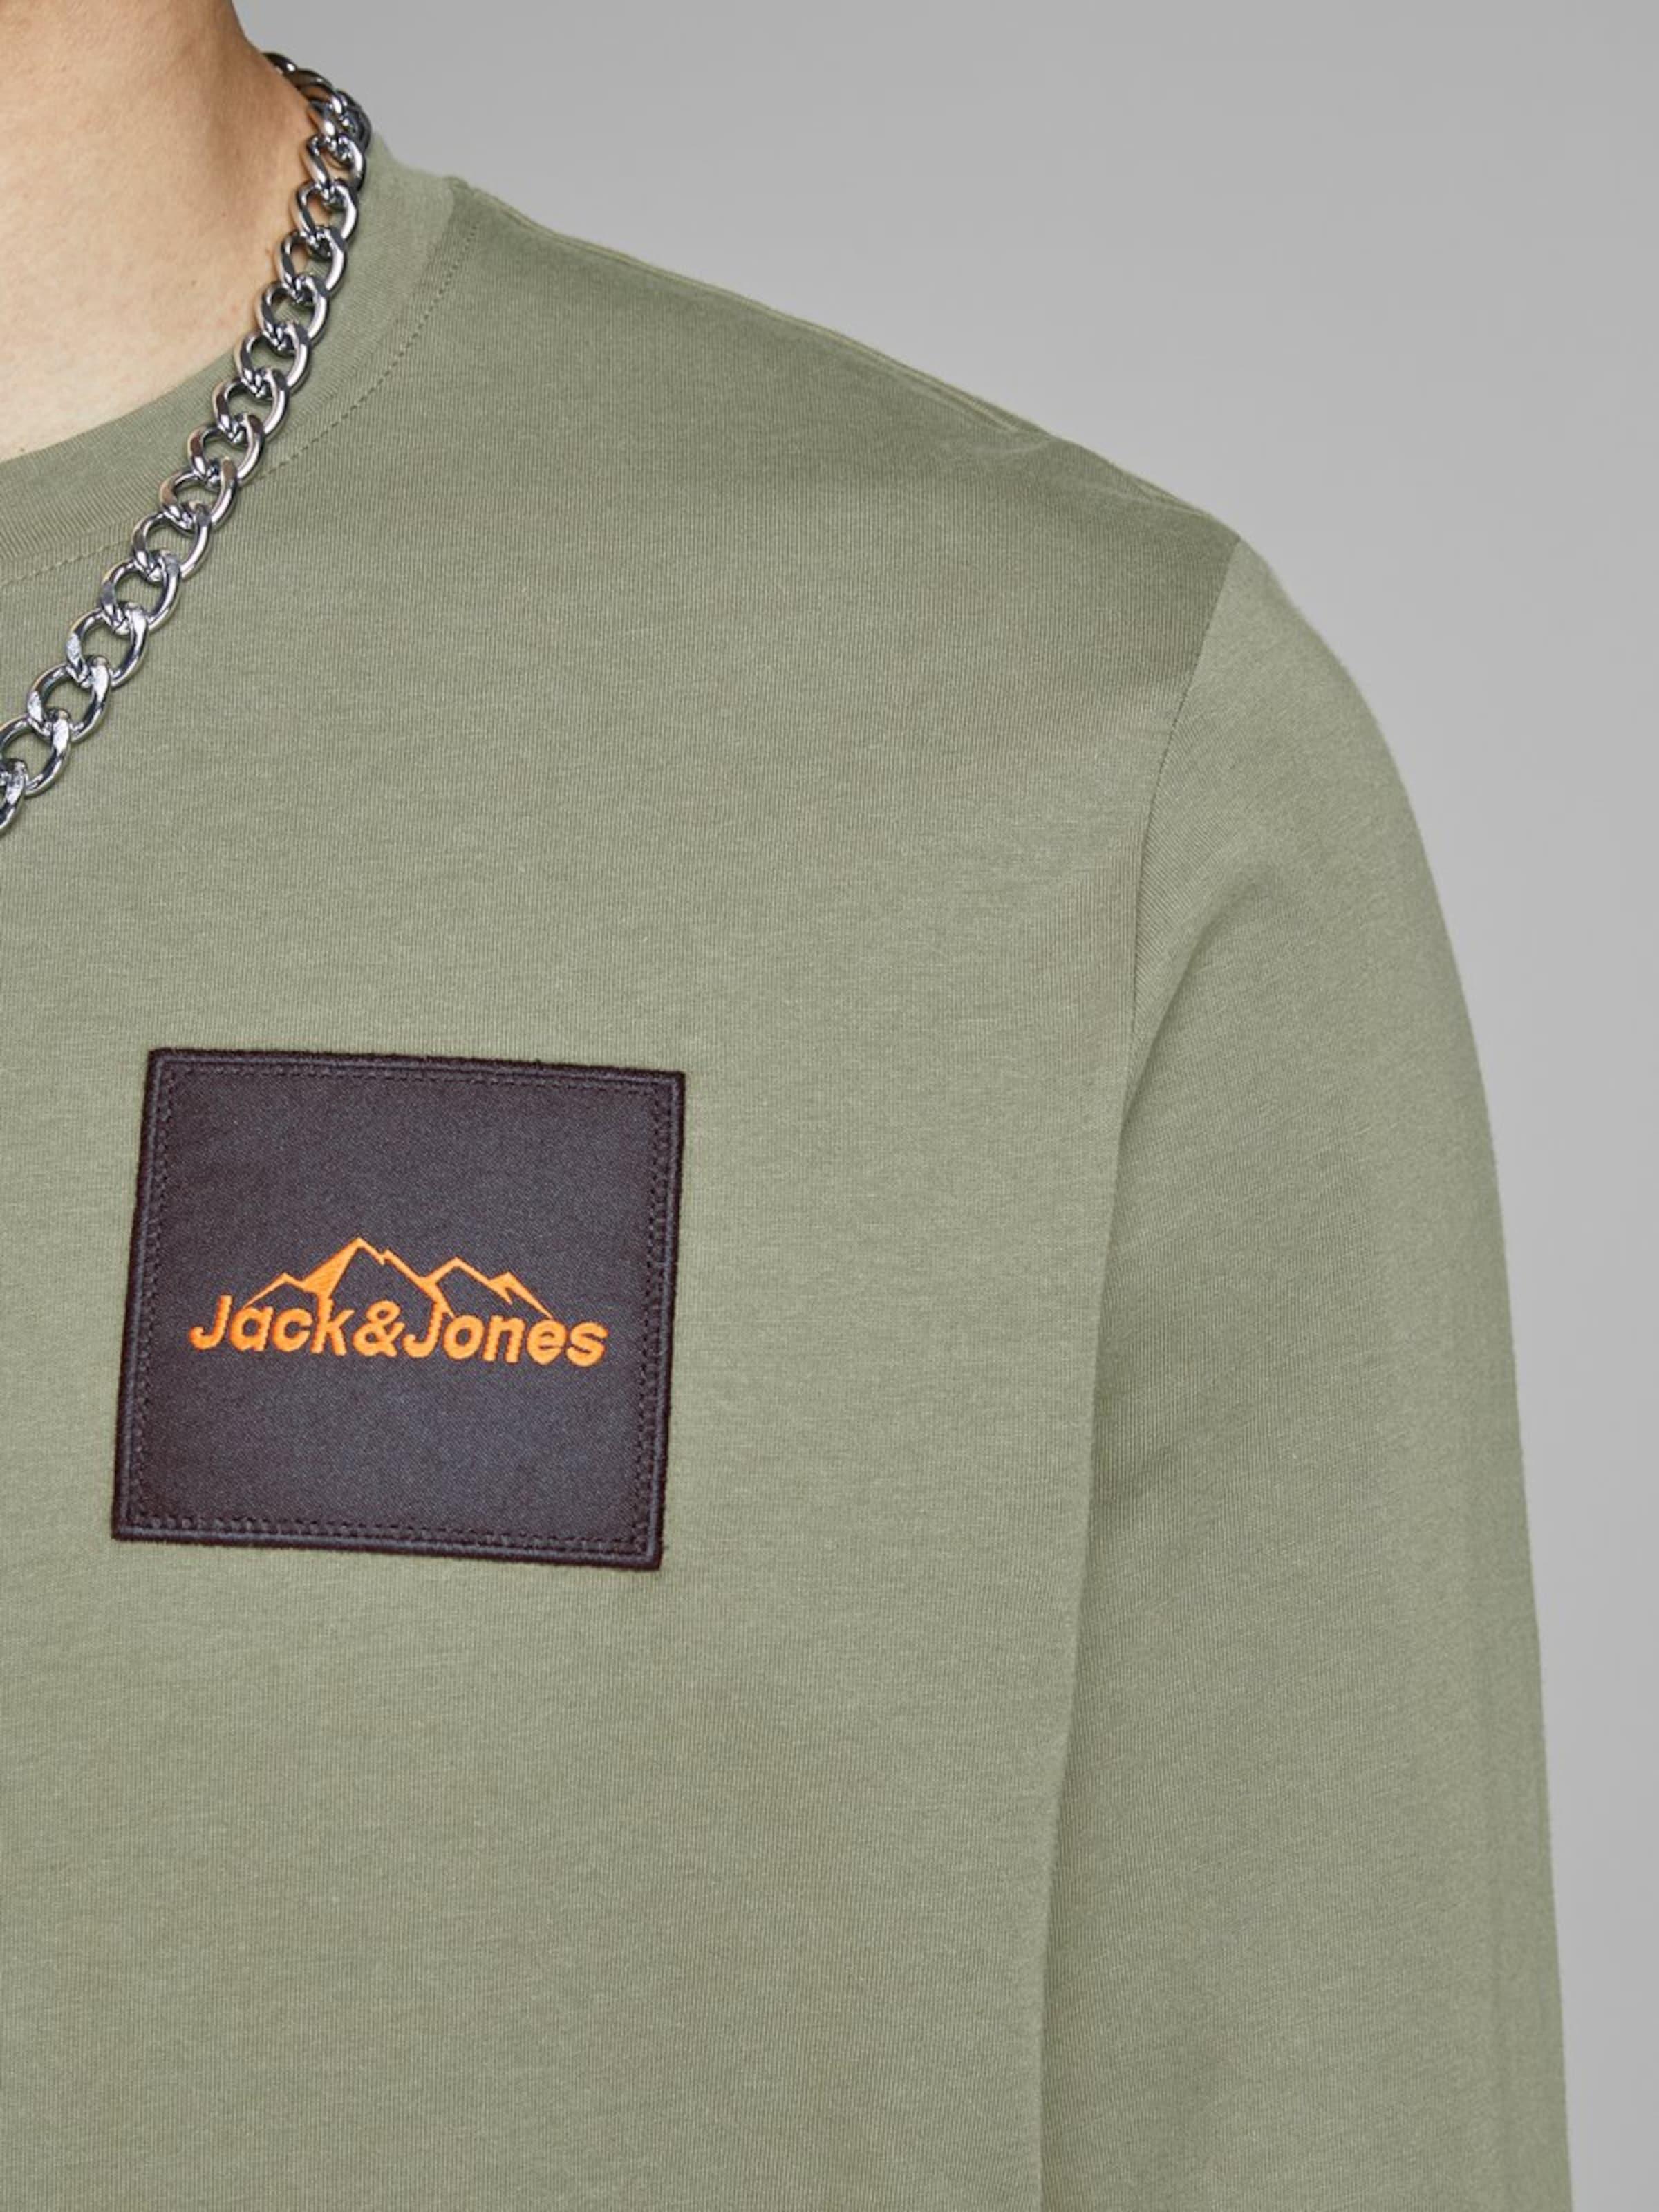 Jackamp; Longsleeve Jones Jones Oliv Jackamp; Longsleeve In Oliv In eDEIWH2Y9